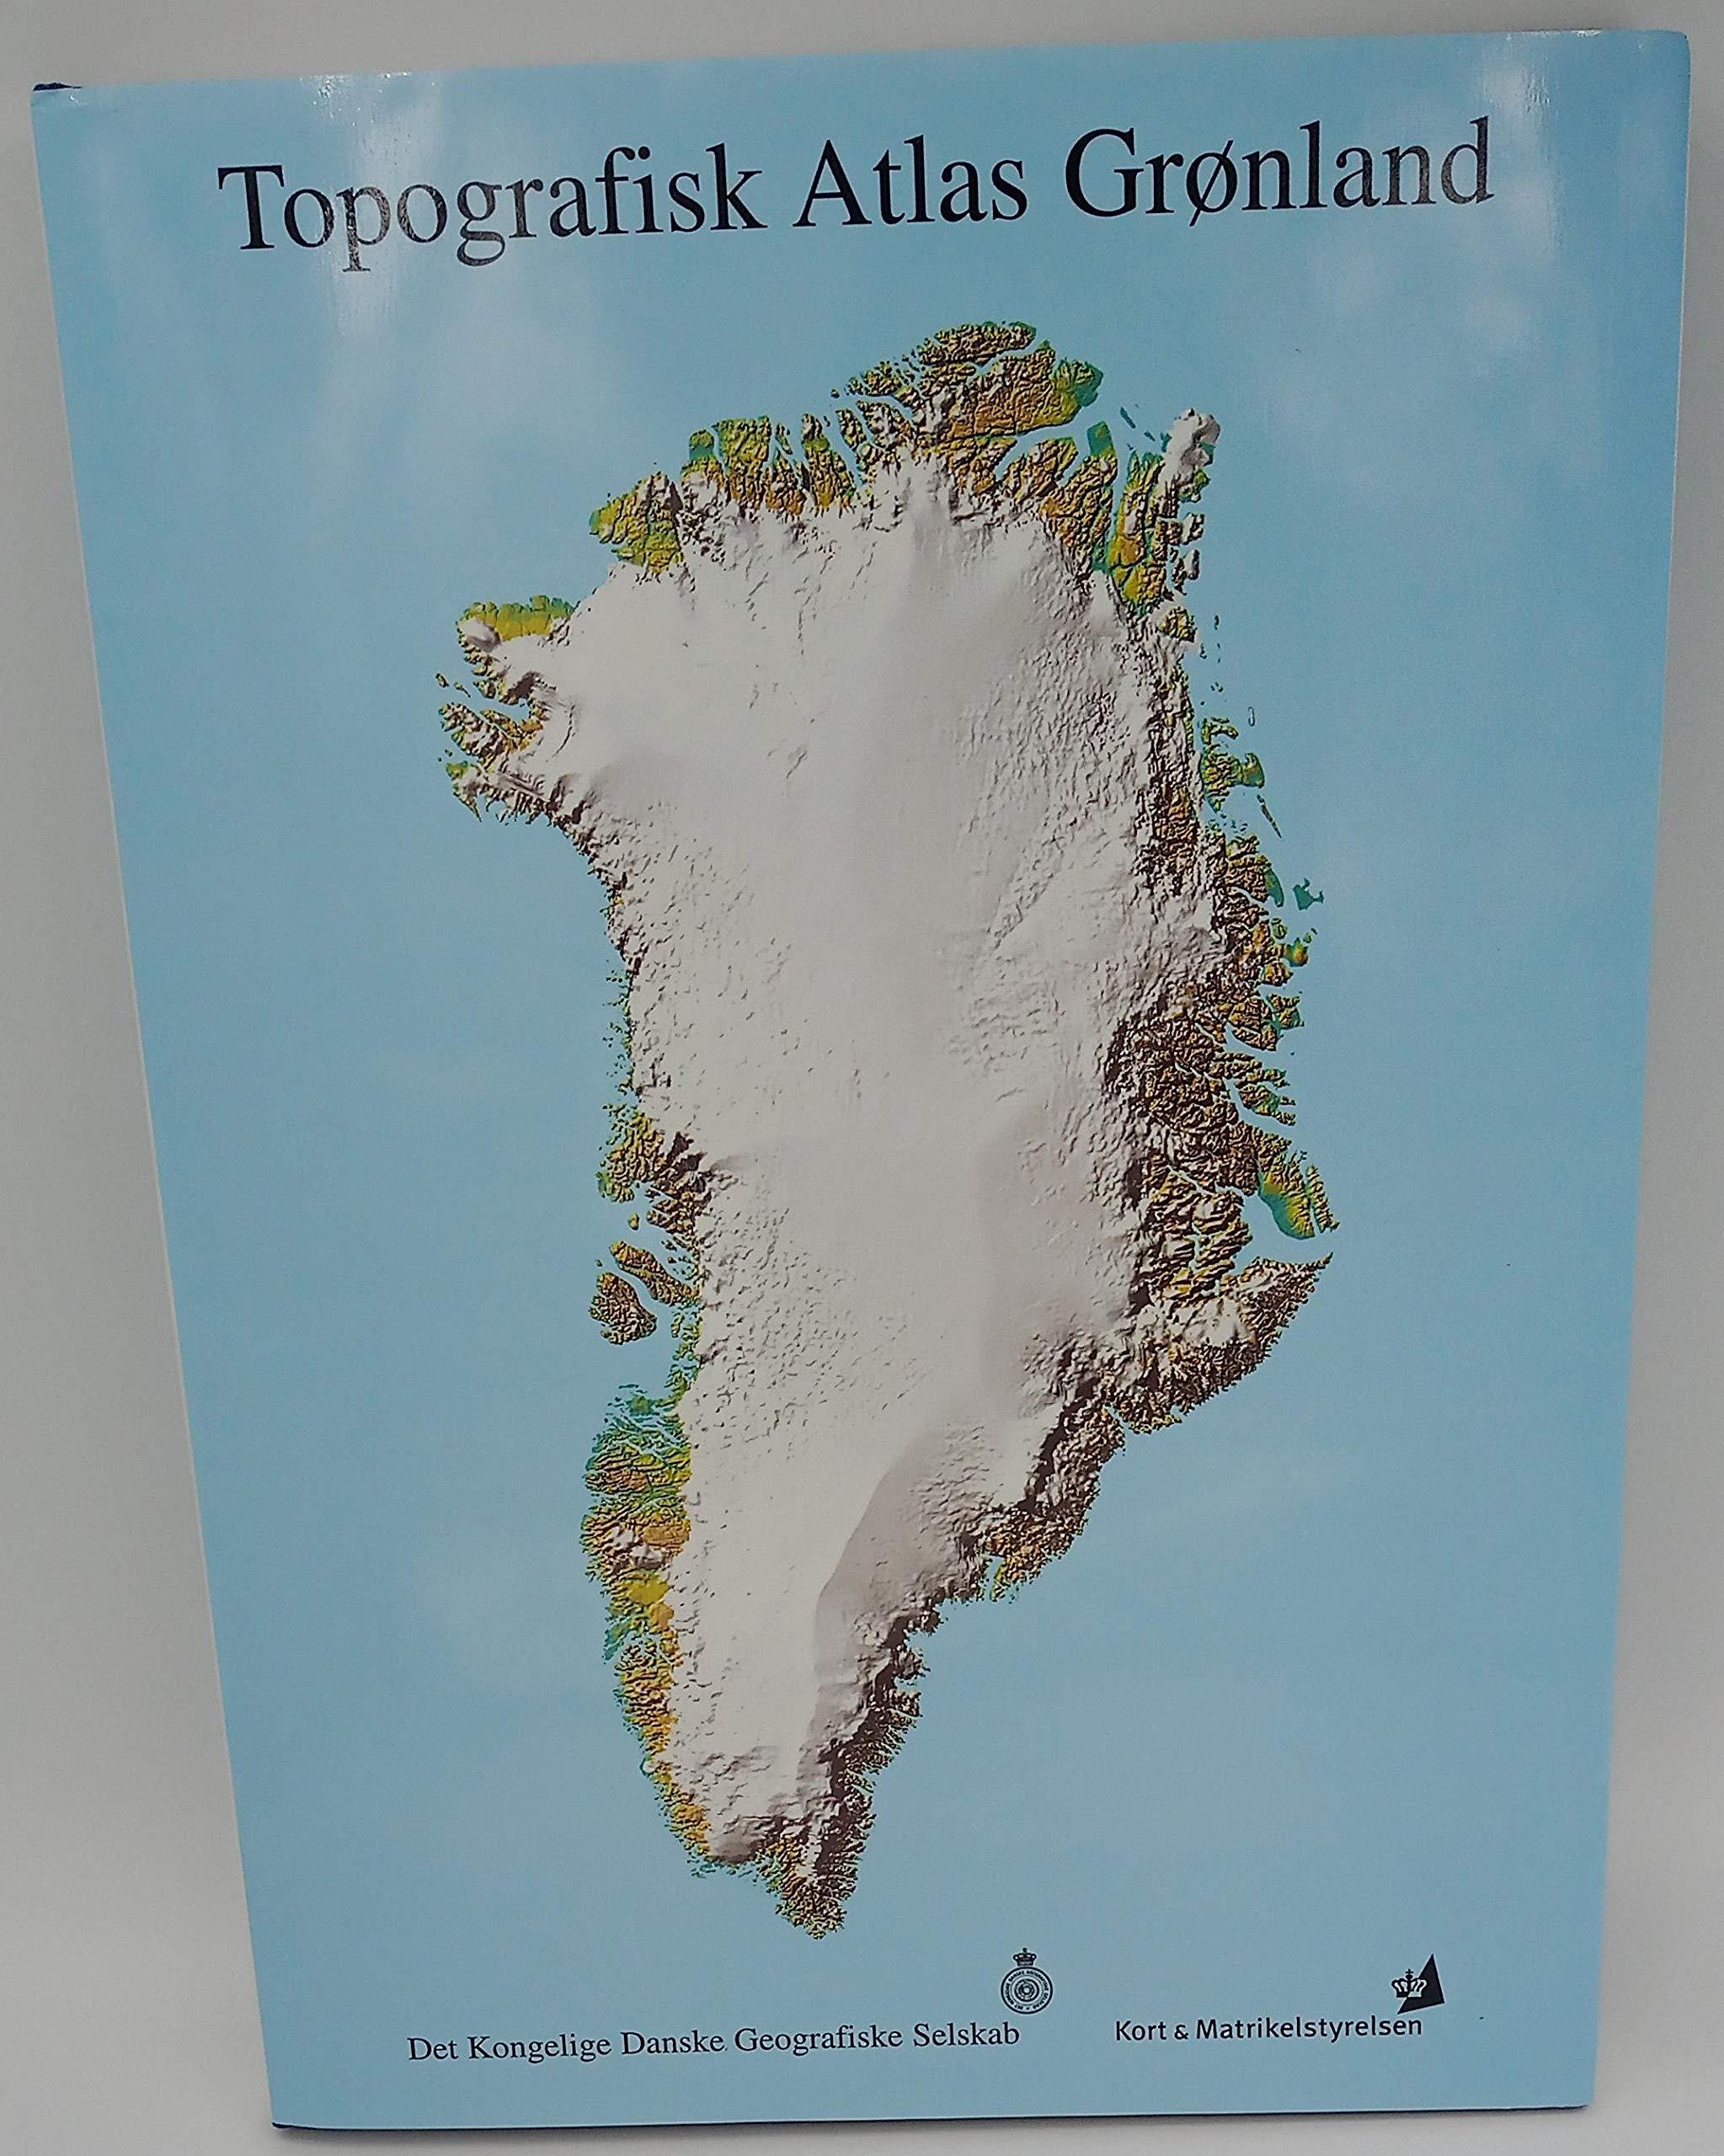 Topological Atlas Of Greenland Topografisk Atlas Gronland Kort